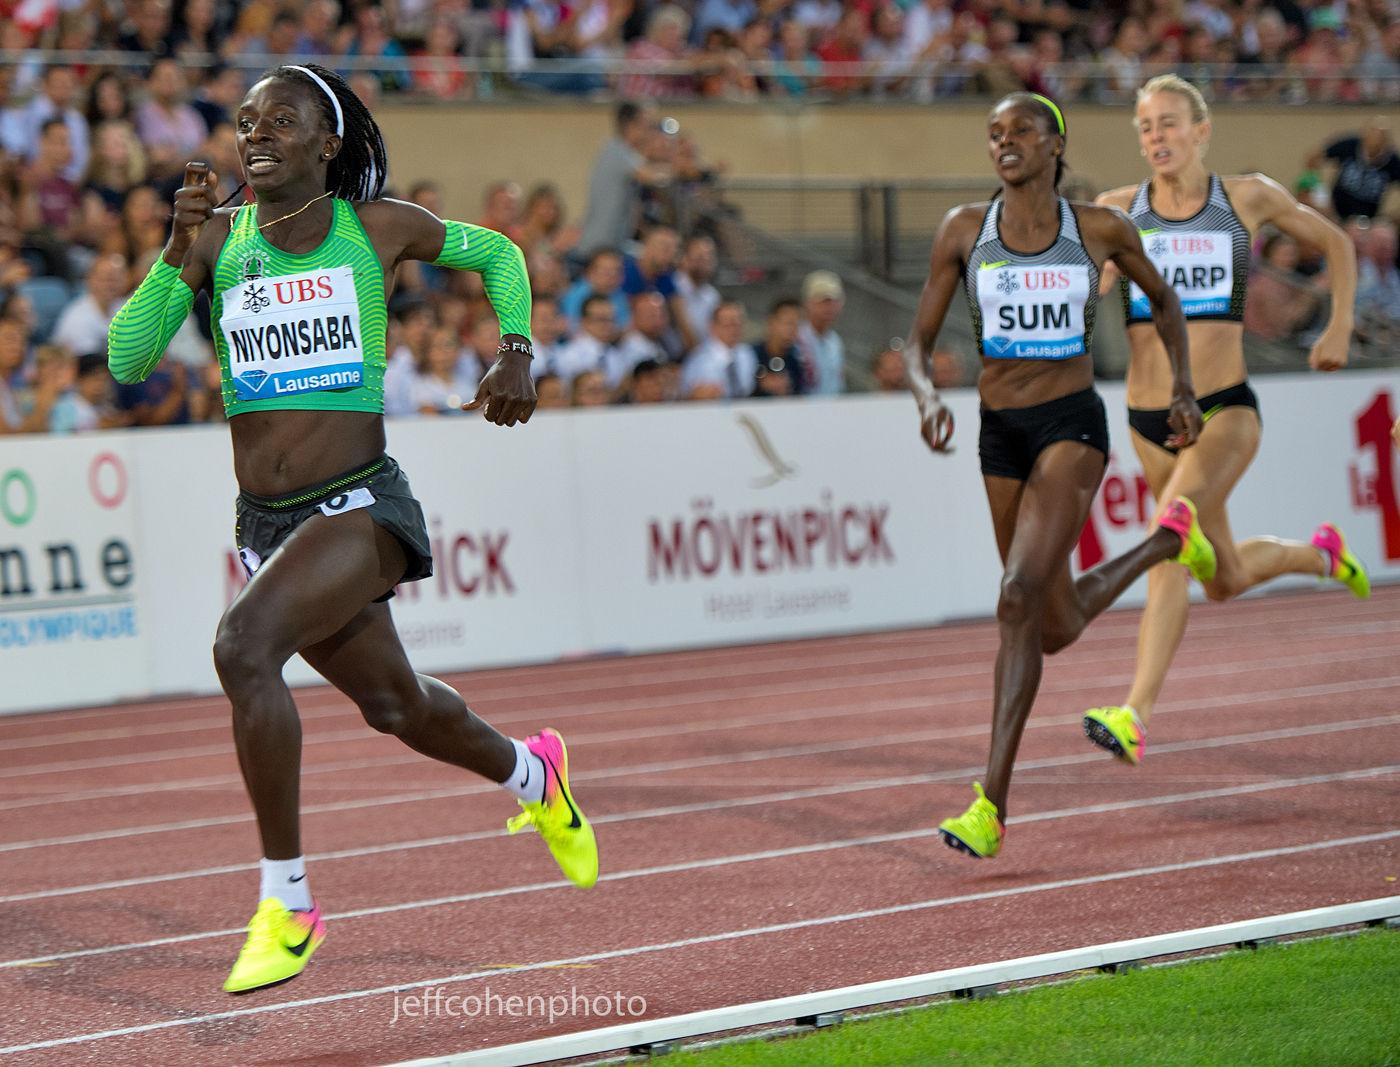 1r2016_athletissima_lausanne_niyonsaba_800mw_jeff_cohen_photo_1193_web.jpg